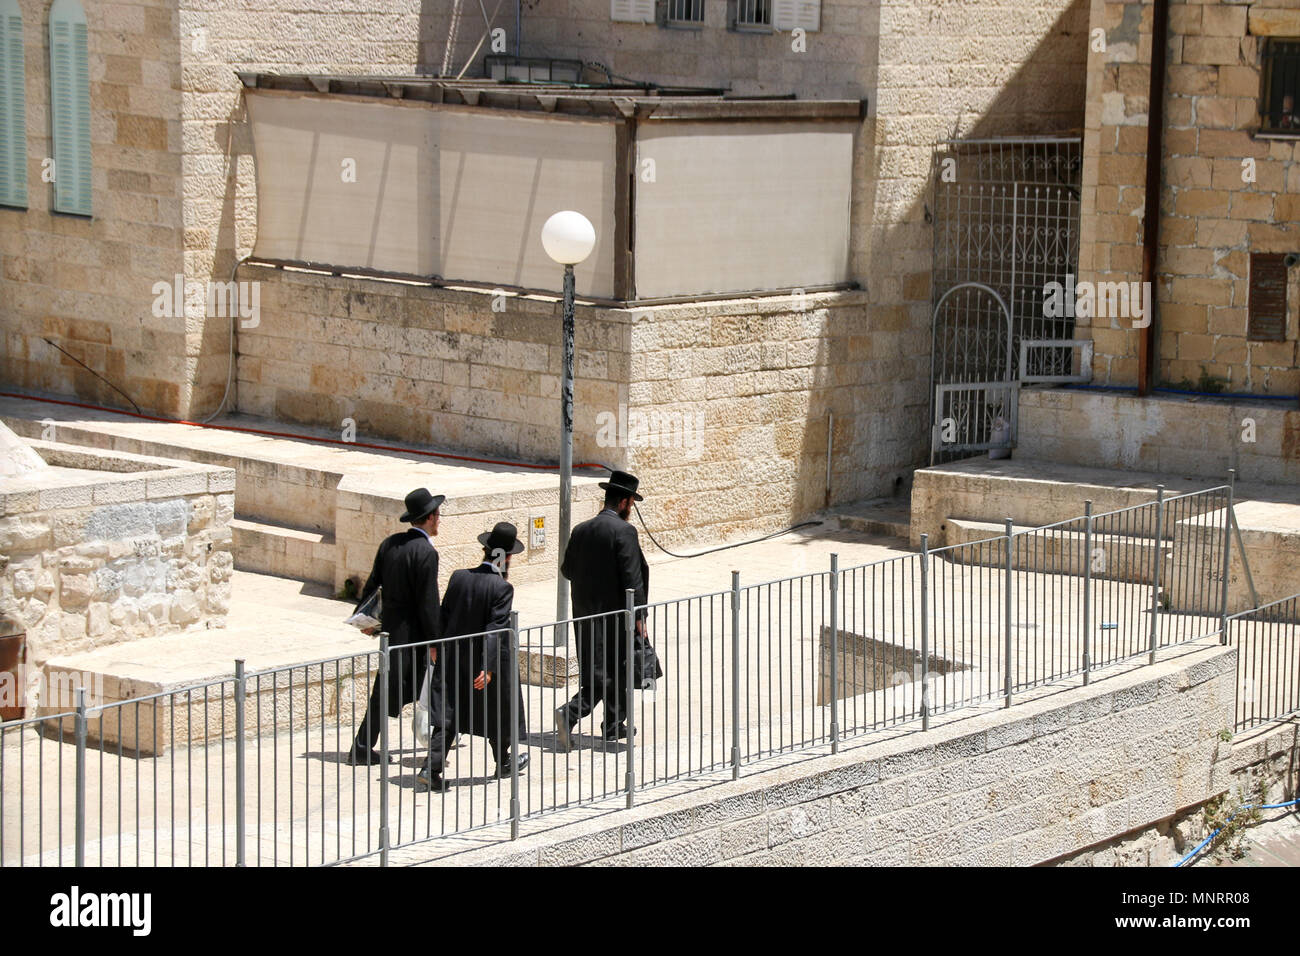 Jerusalem, Israel - May 16, 2018: Three Orthodox Jews walk through the Old City of Jerusalem, Israel. - Stock Image